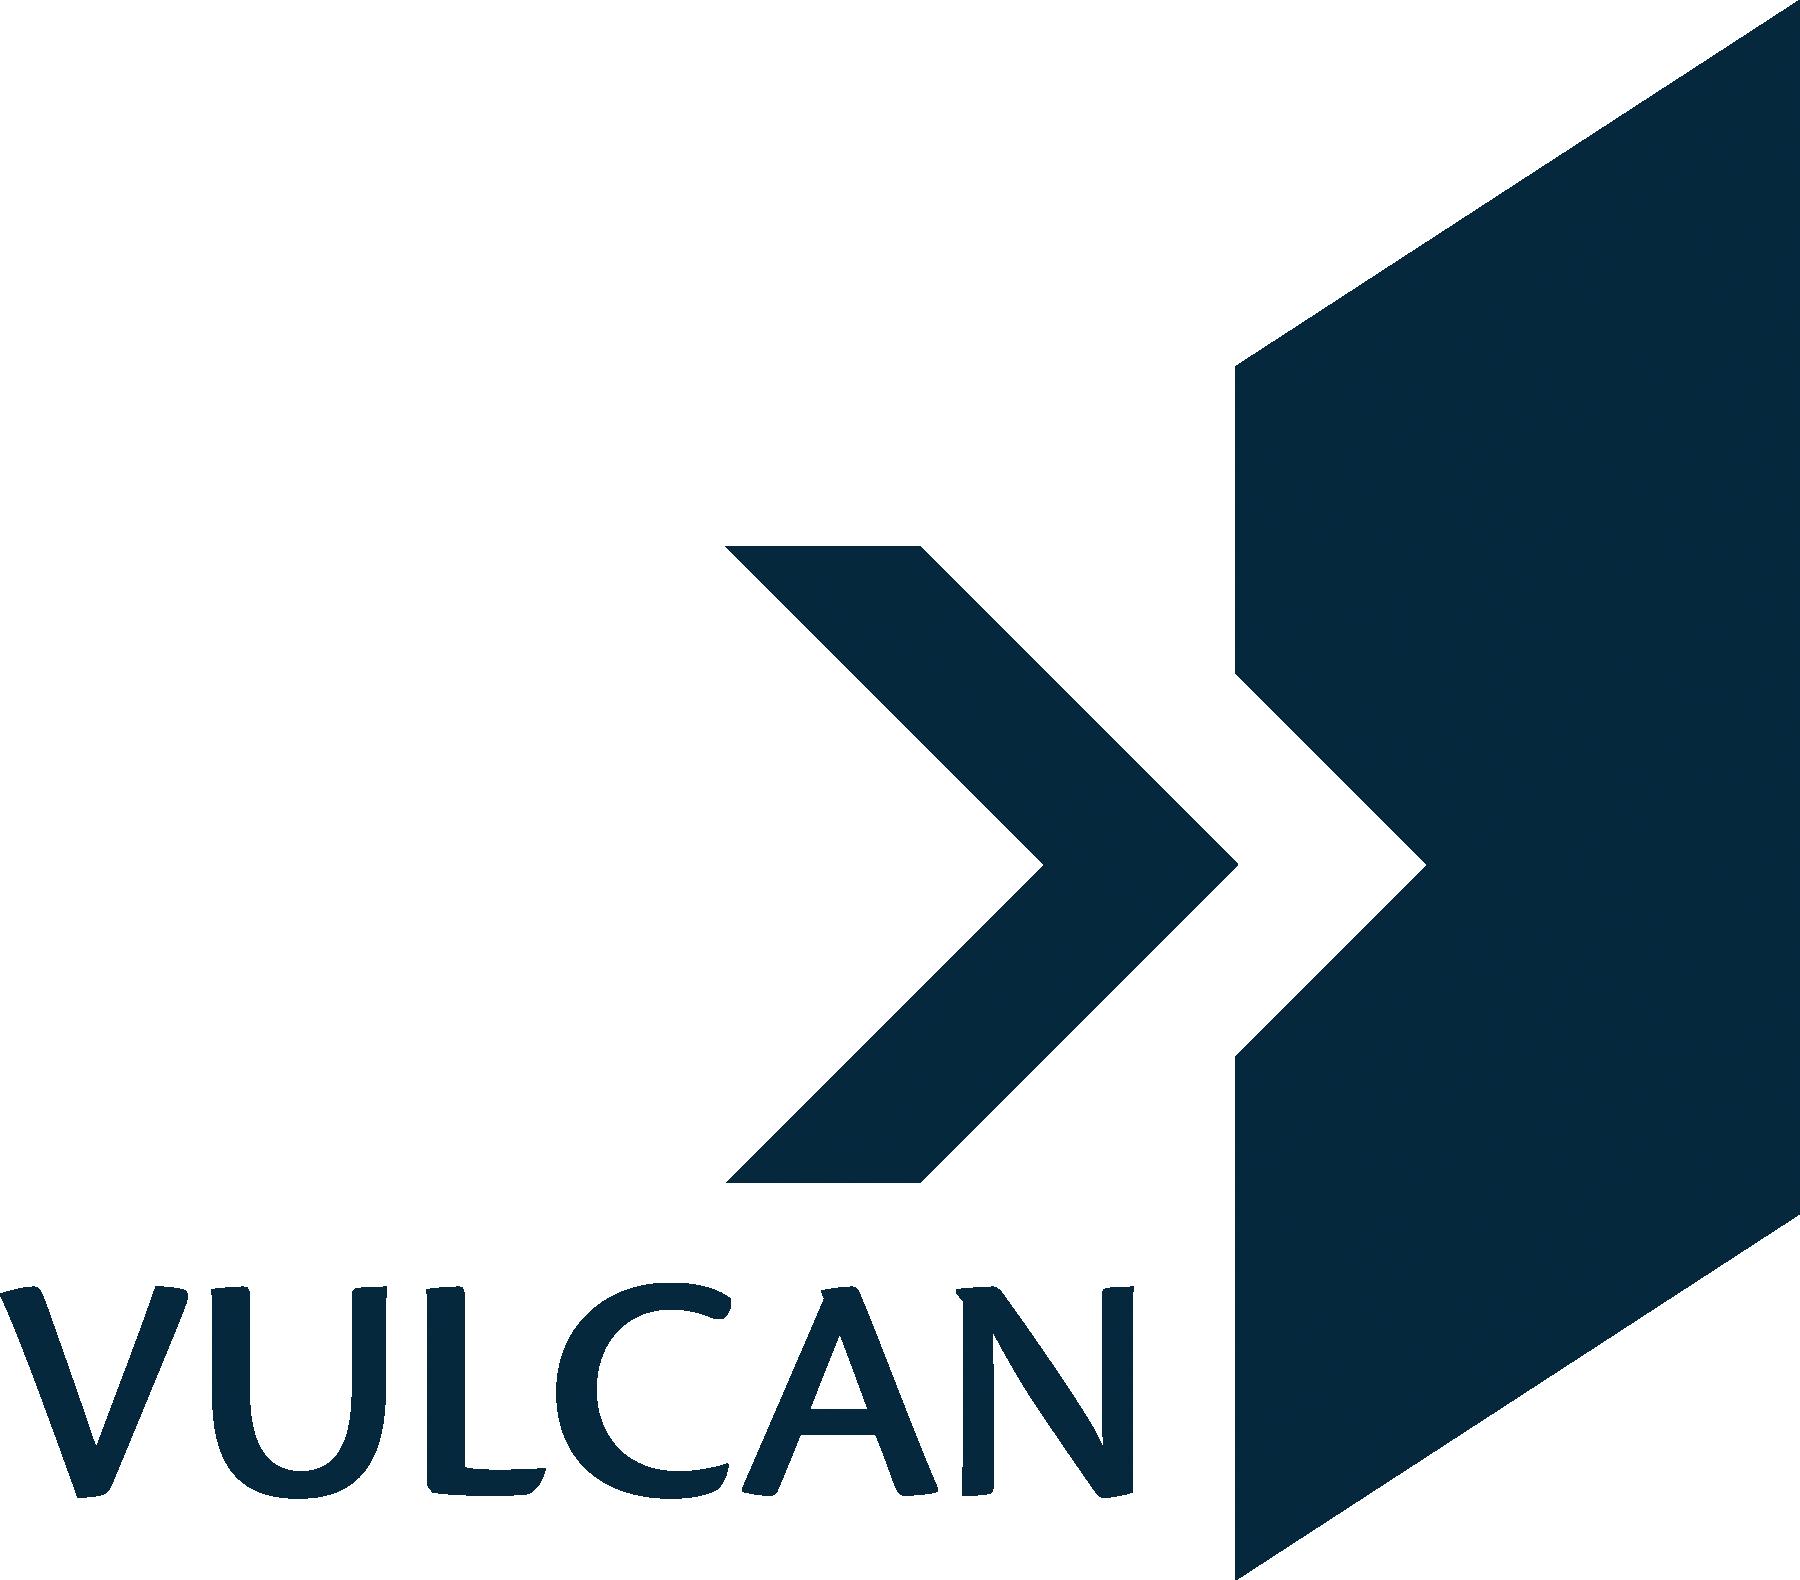 Vulcan logo